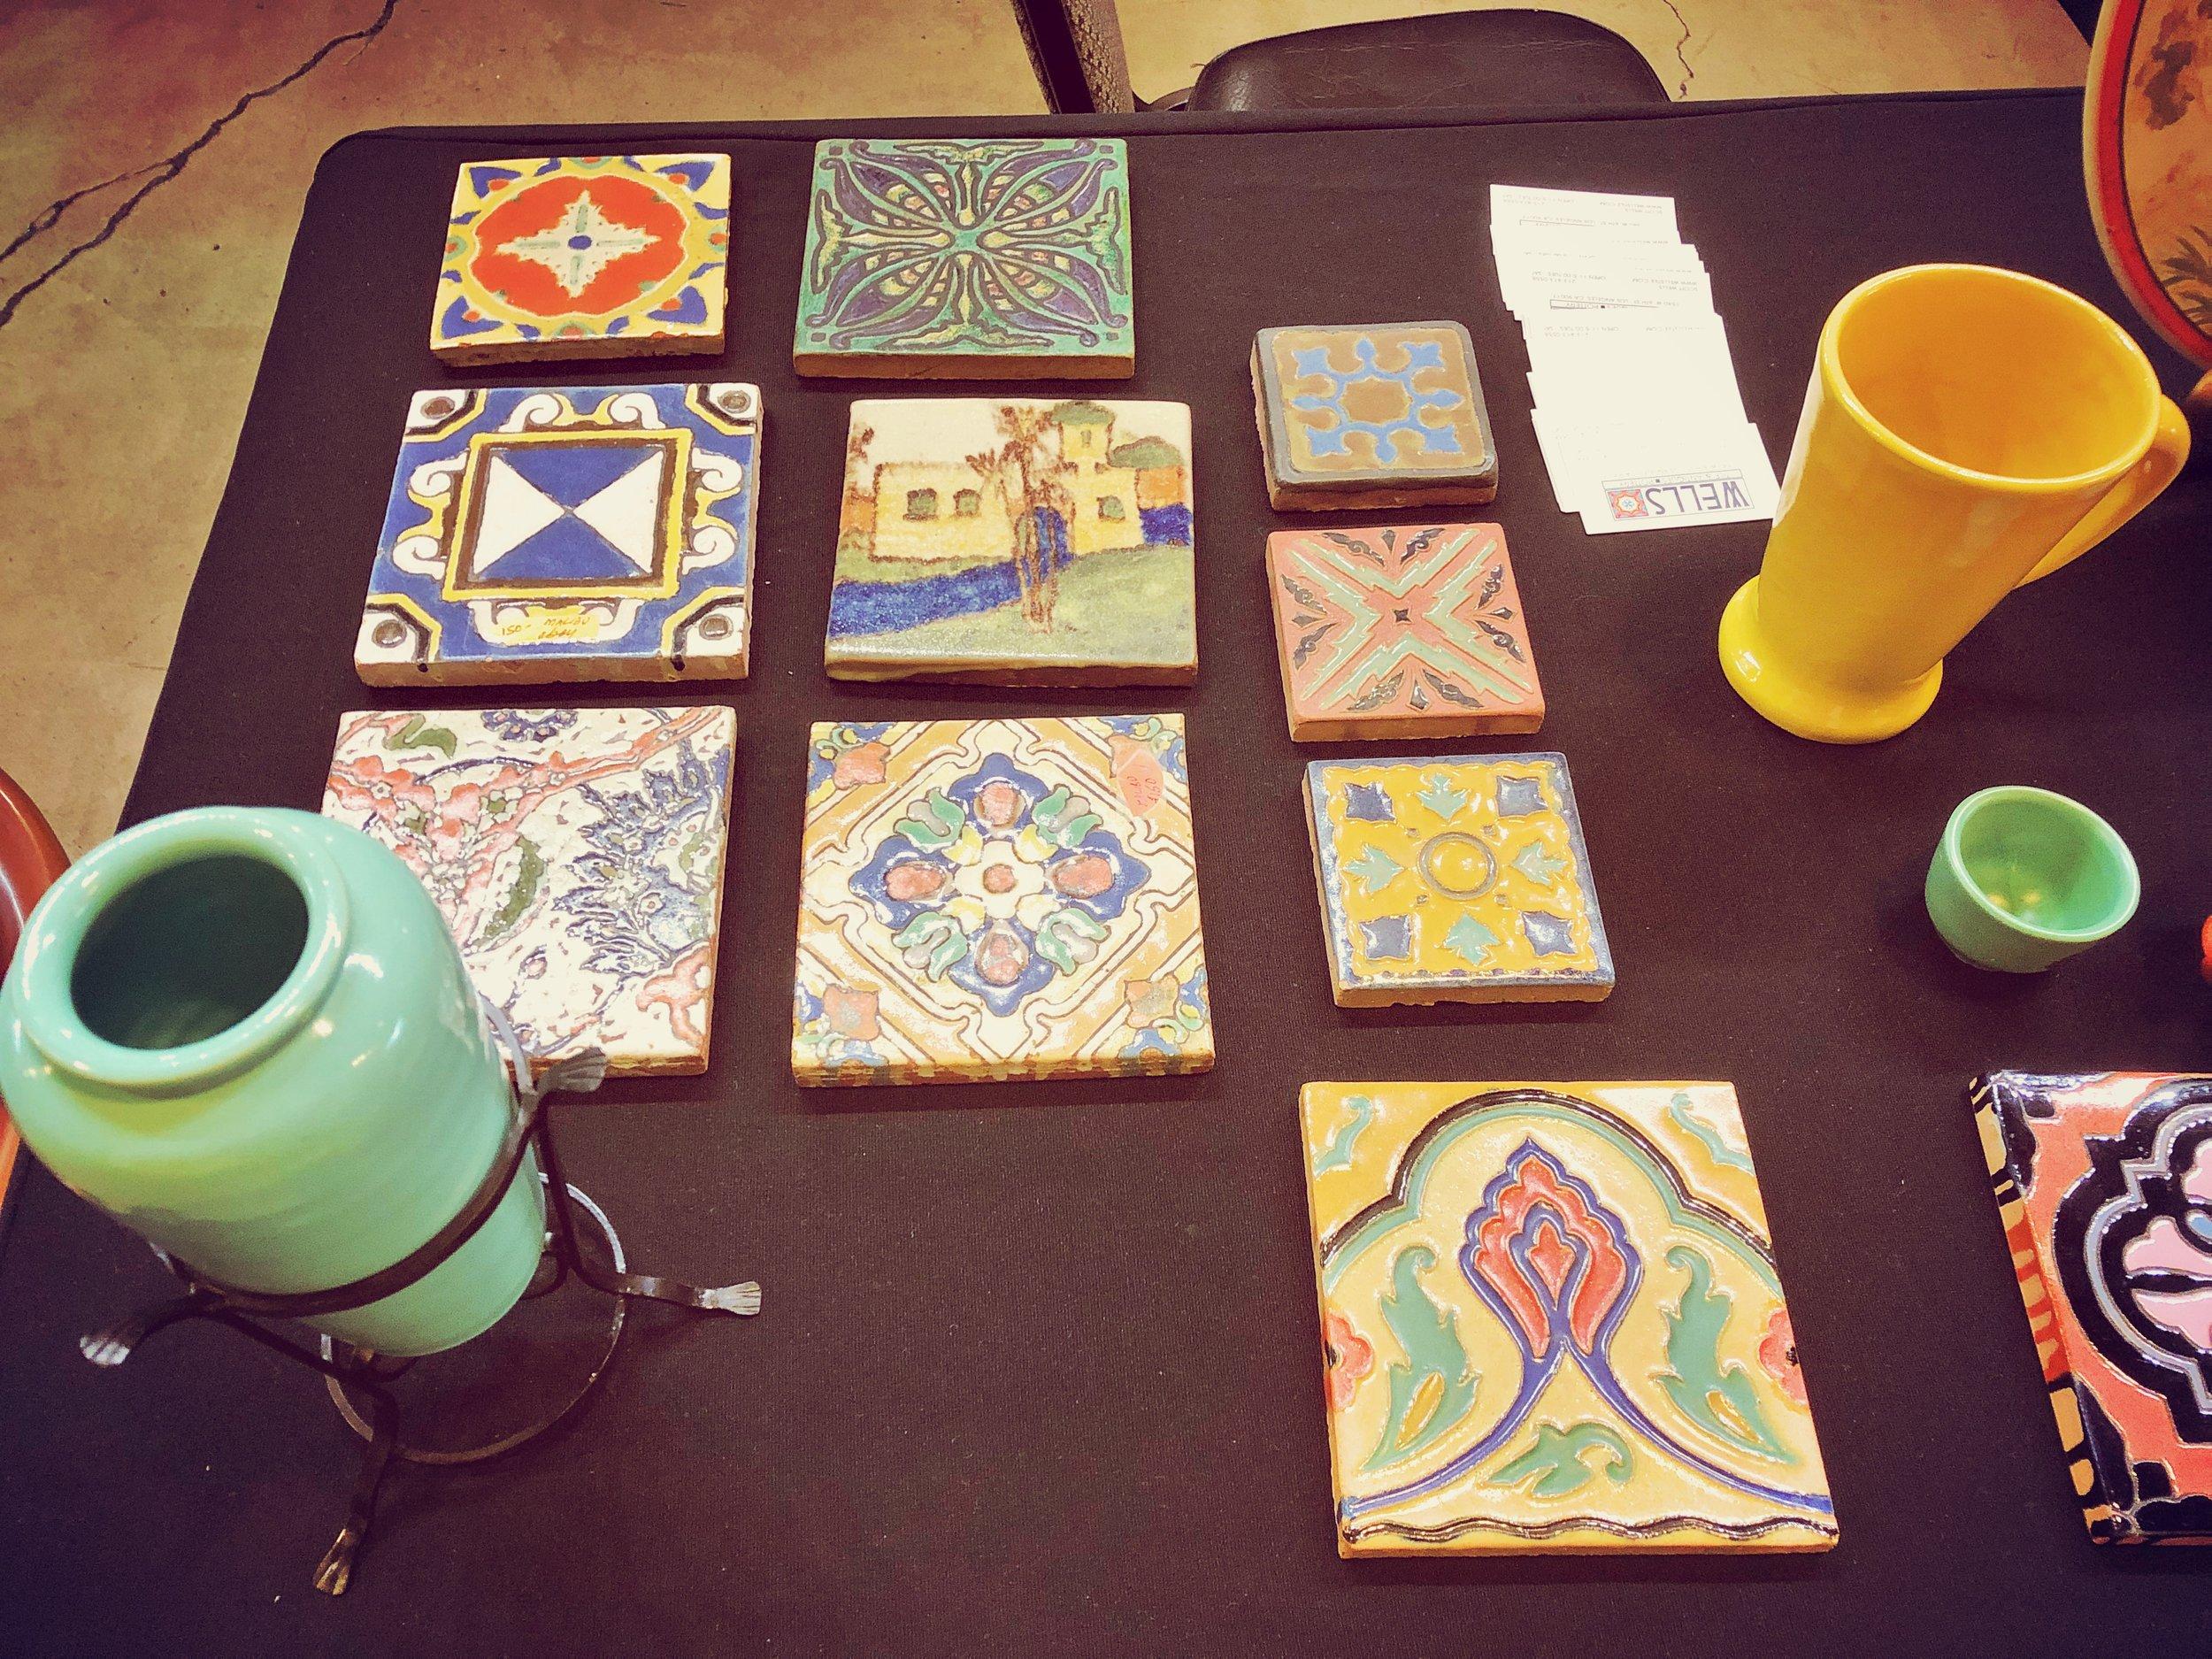 1920s Tiles & Pottery, California